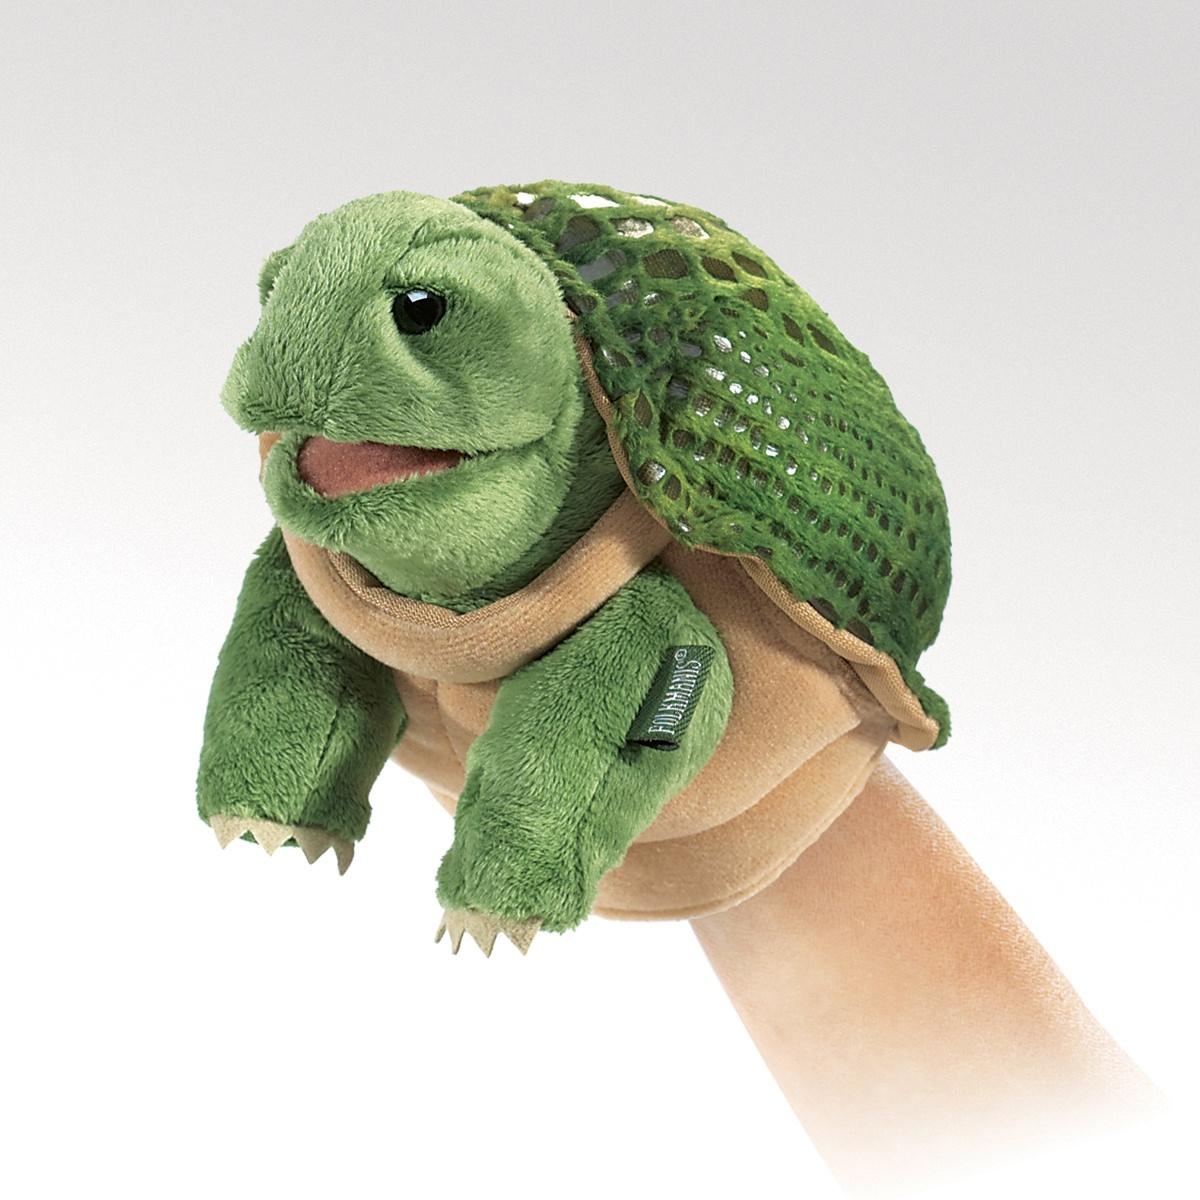 Želva maňásek na ruku plyšový 12,5 × 18 × 15cm Folkmanis